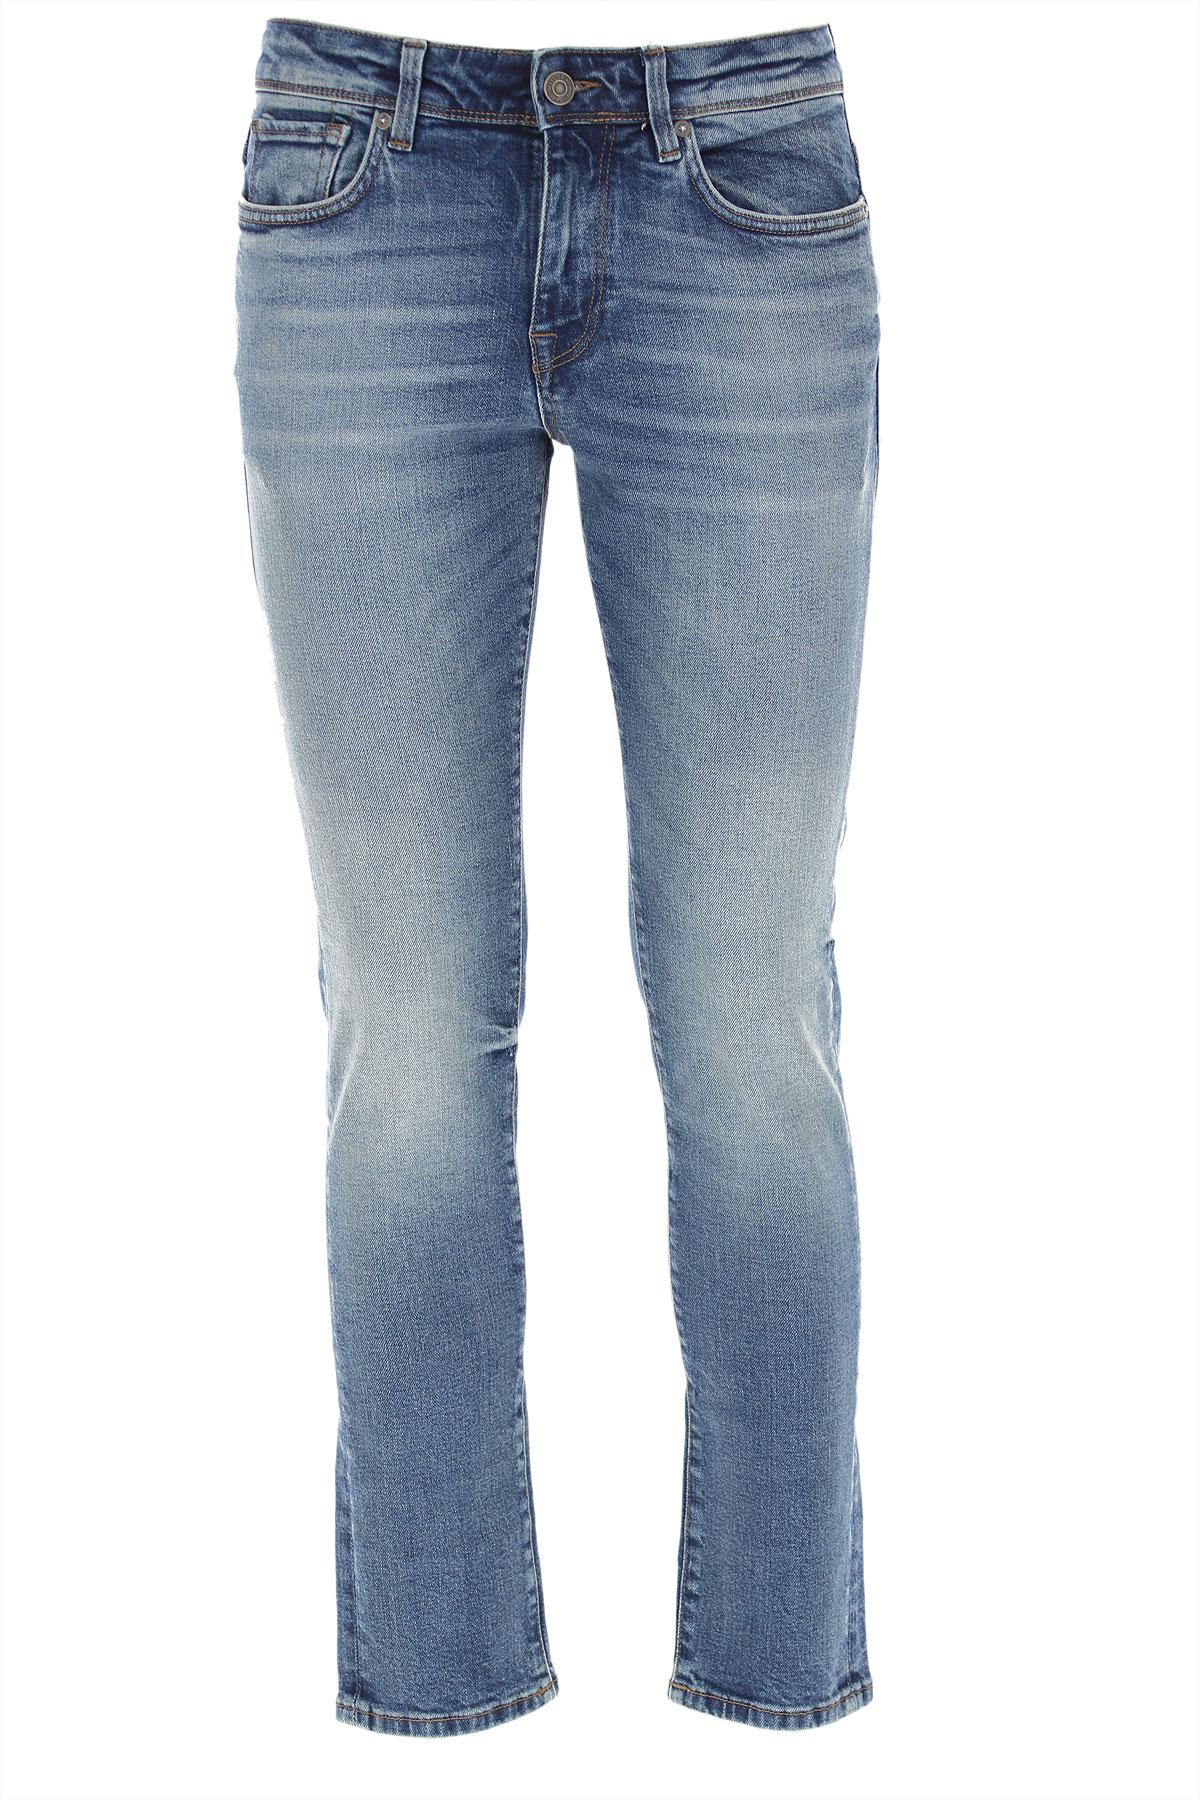 Selected Jeans On Sale, Denim, Cotton, 2019, 29 32 33 34 35